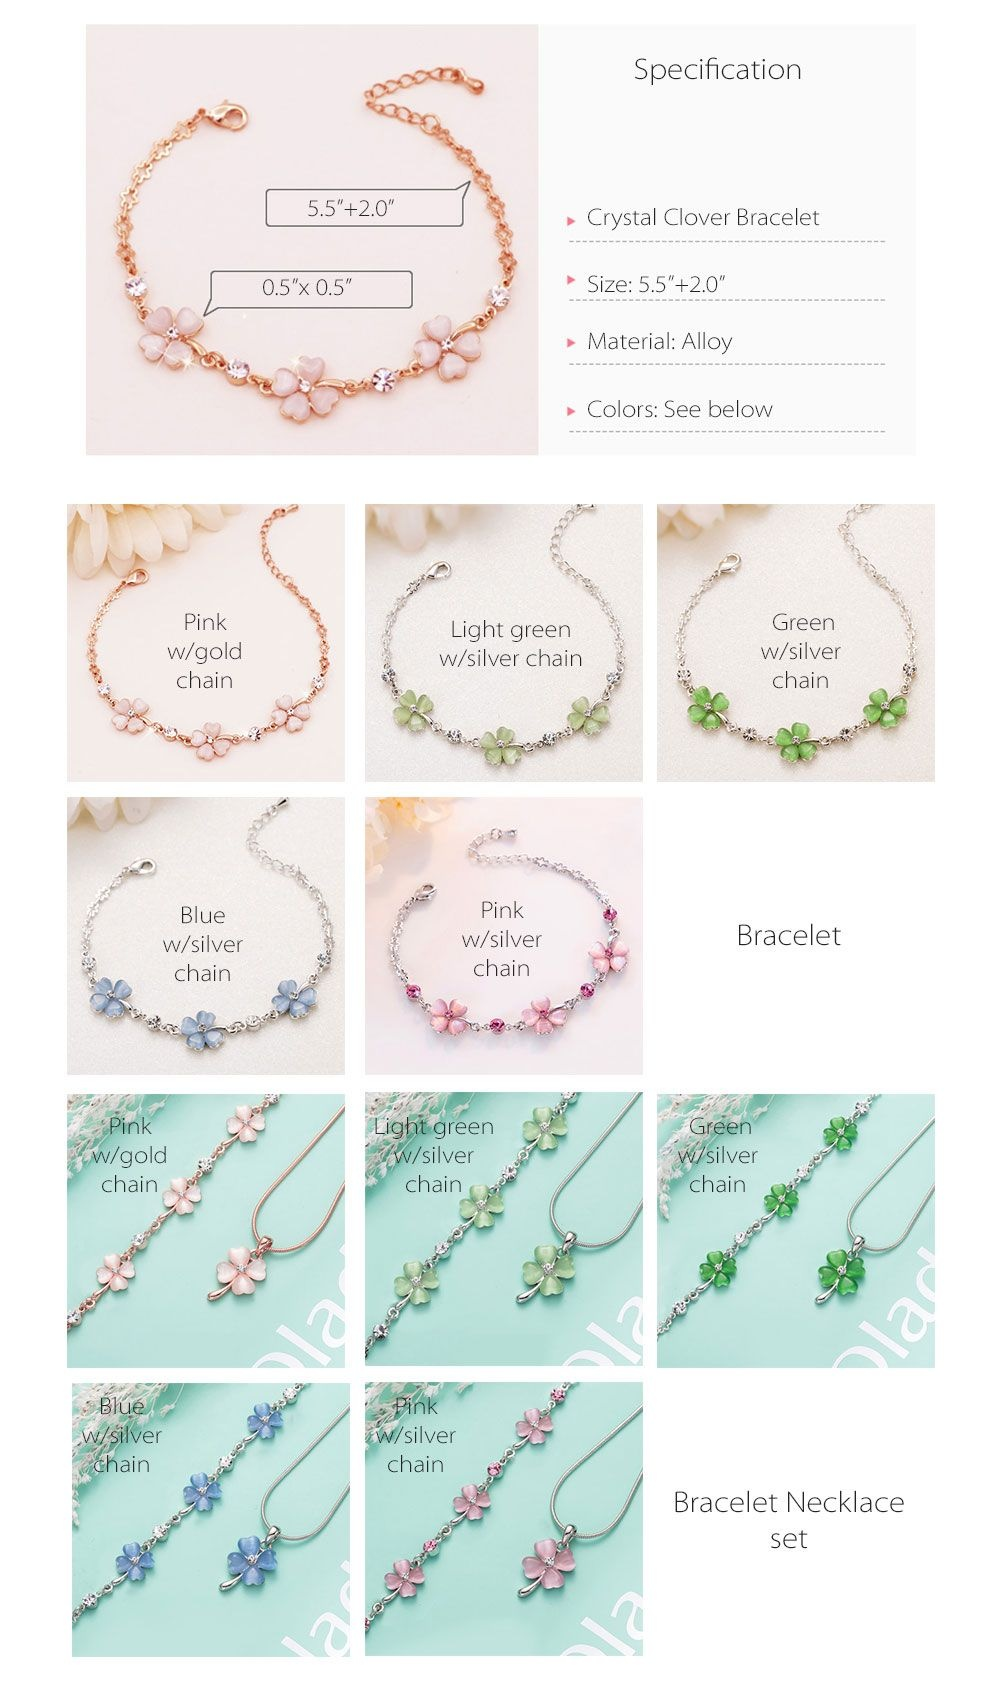 Pink Crystal Clover Bracelet Clover Jewelry